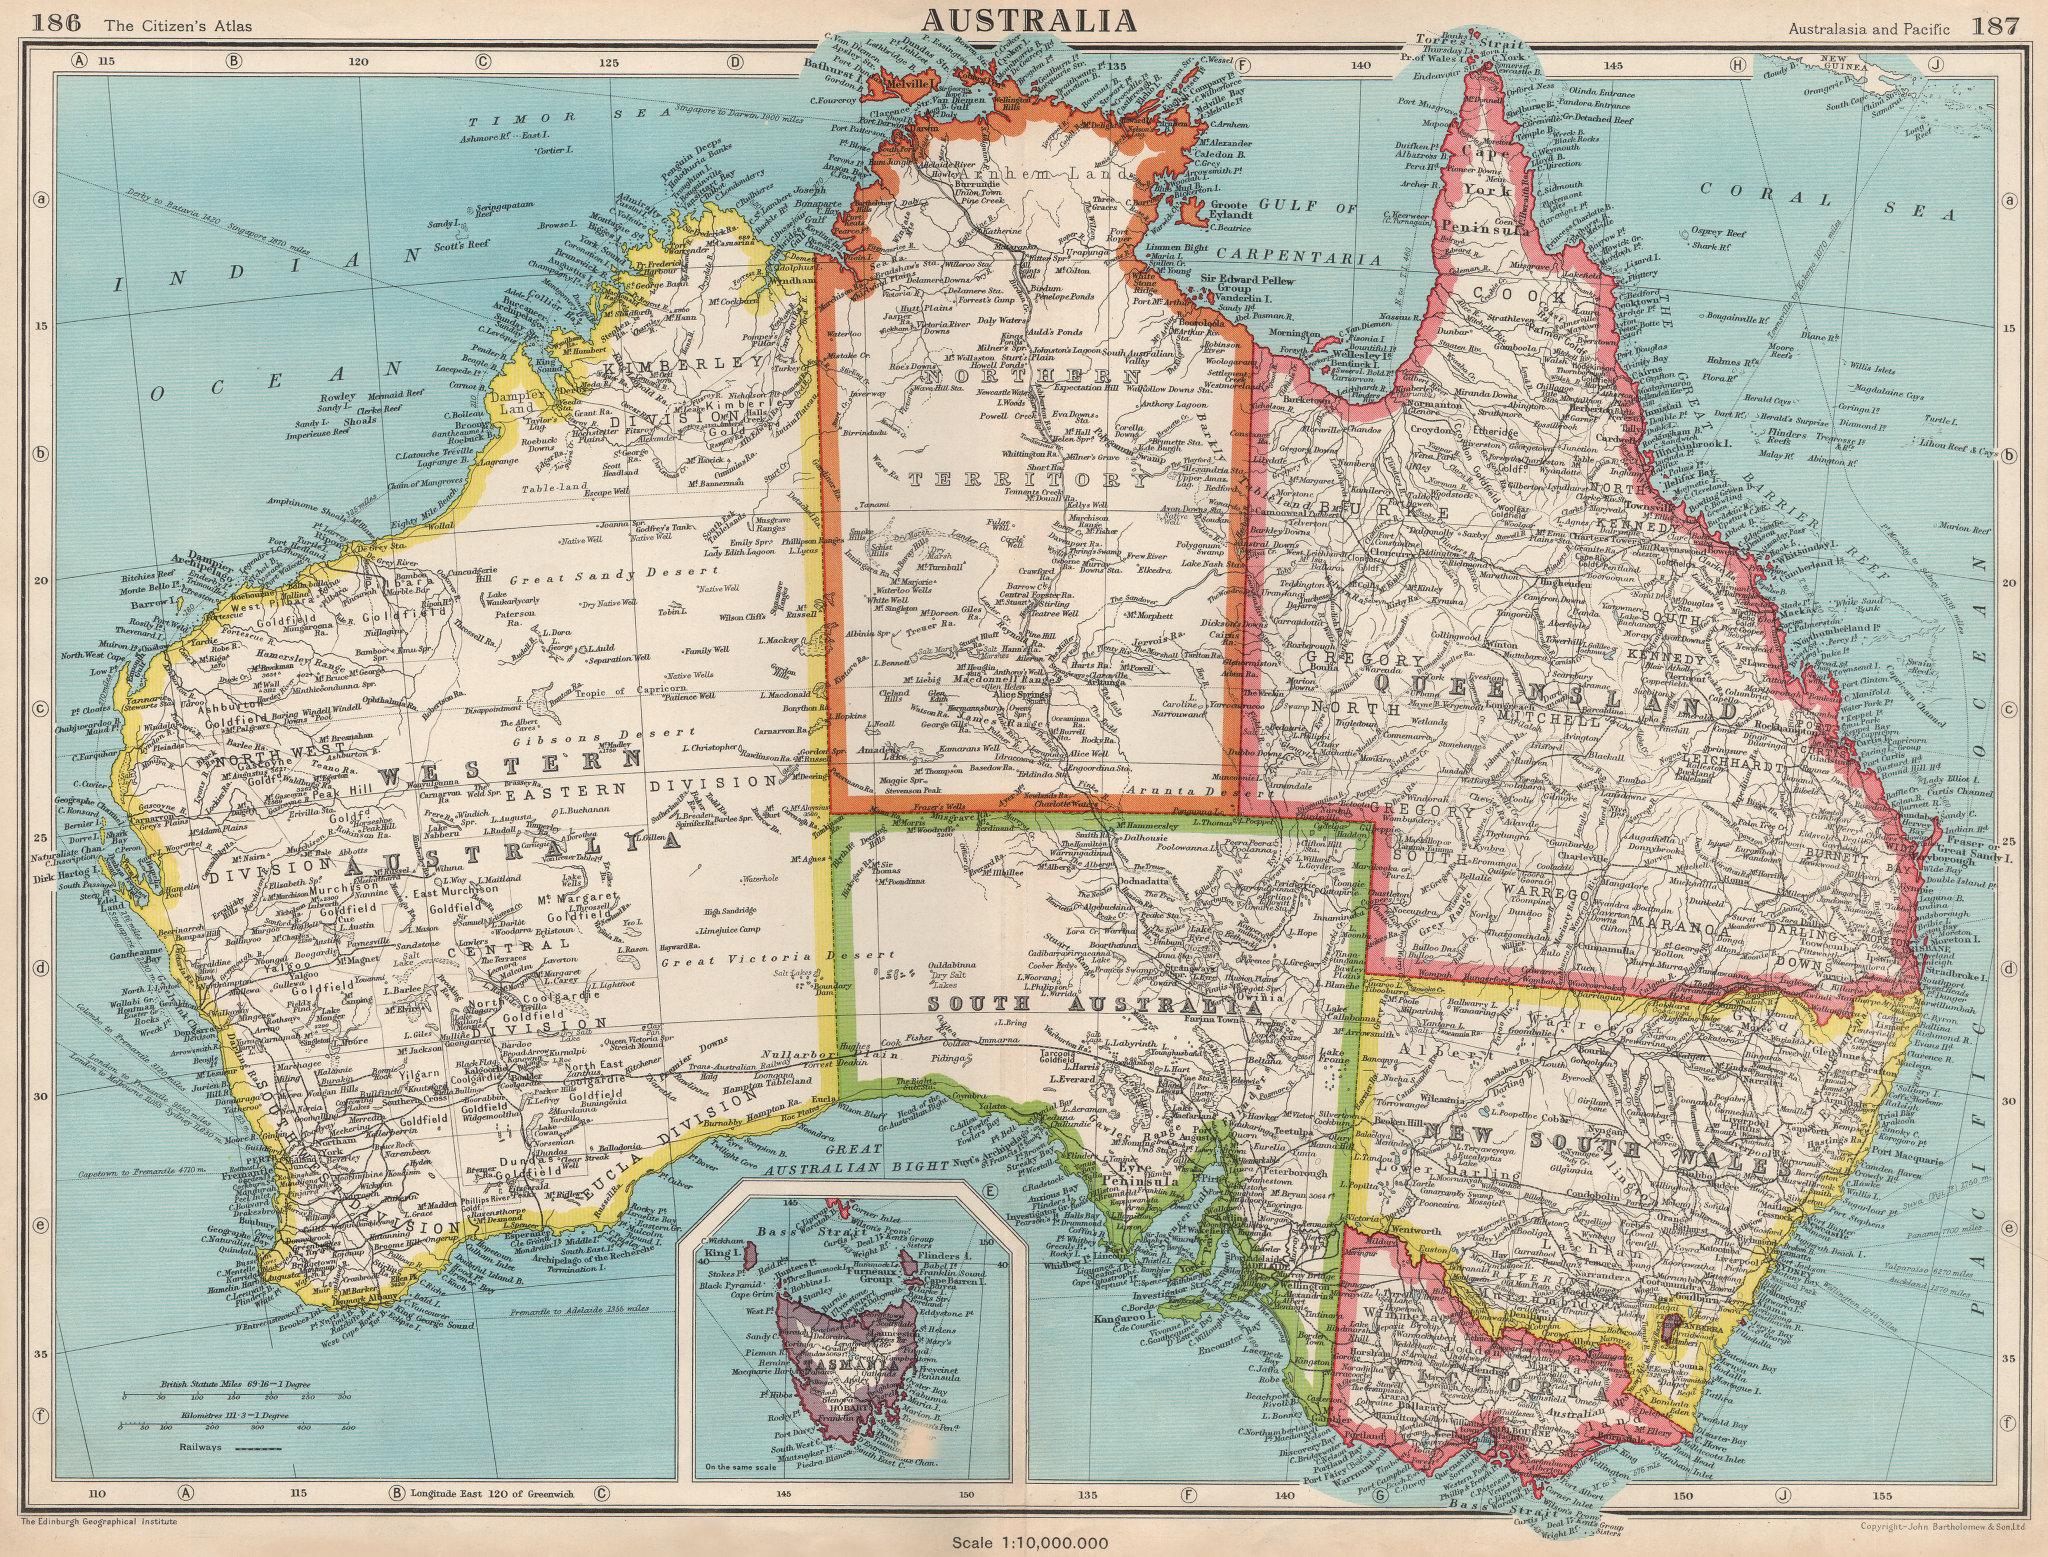 Associate Product AUSTRALIA. Showing states and railways. BARTHOLOMEW 1952 old vintage map chart